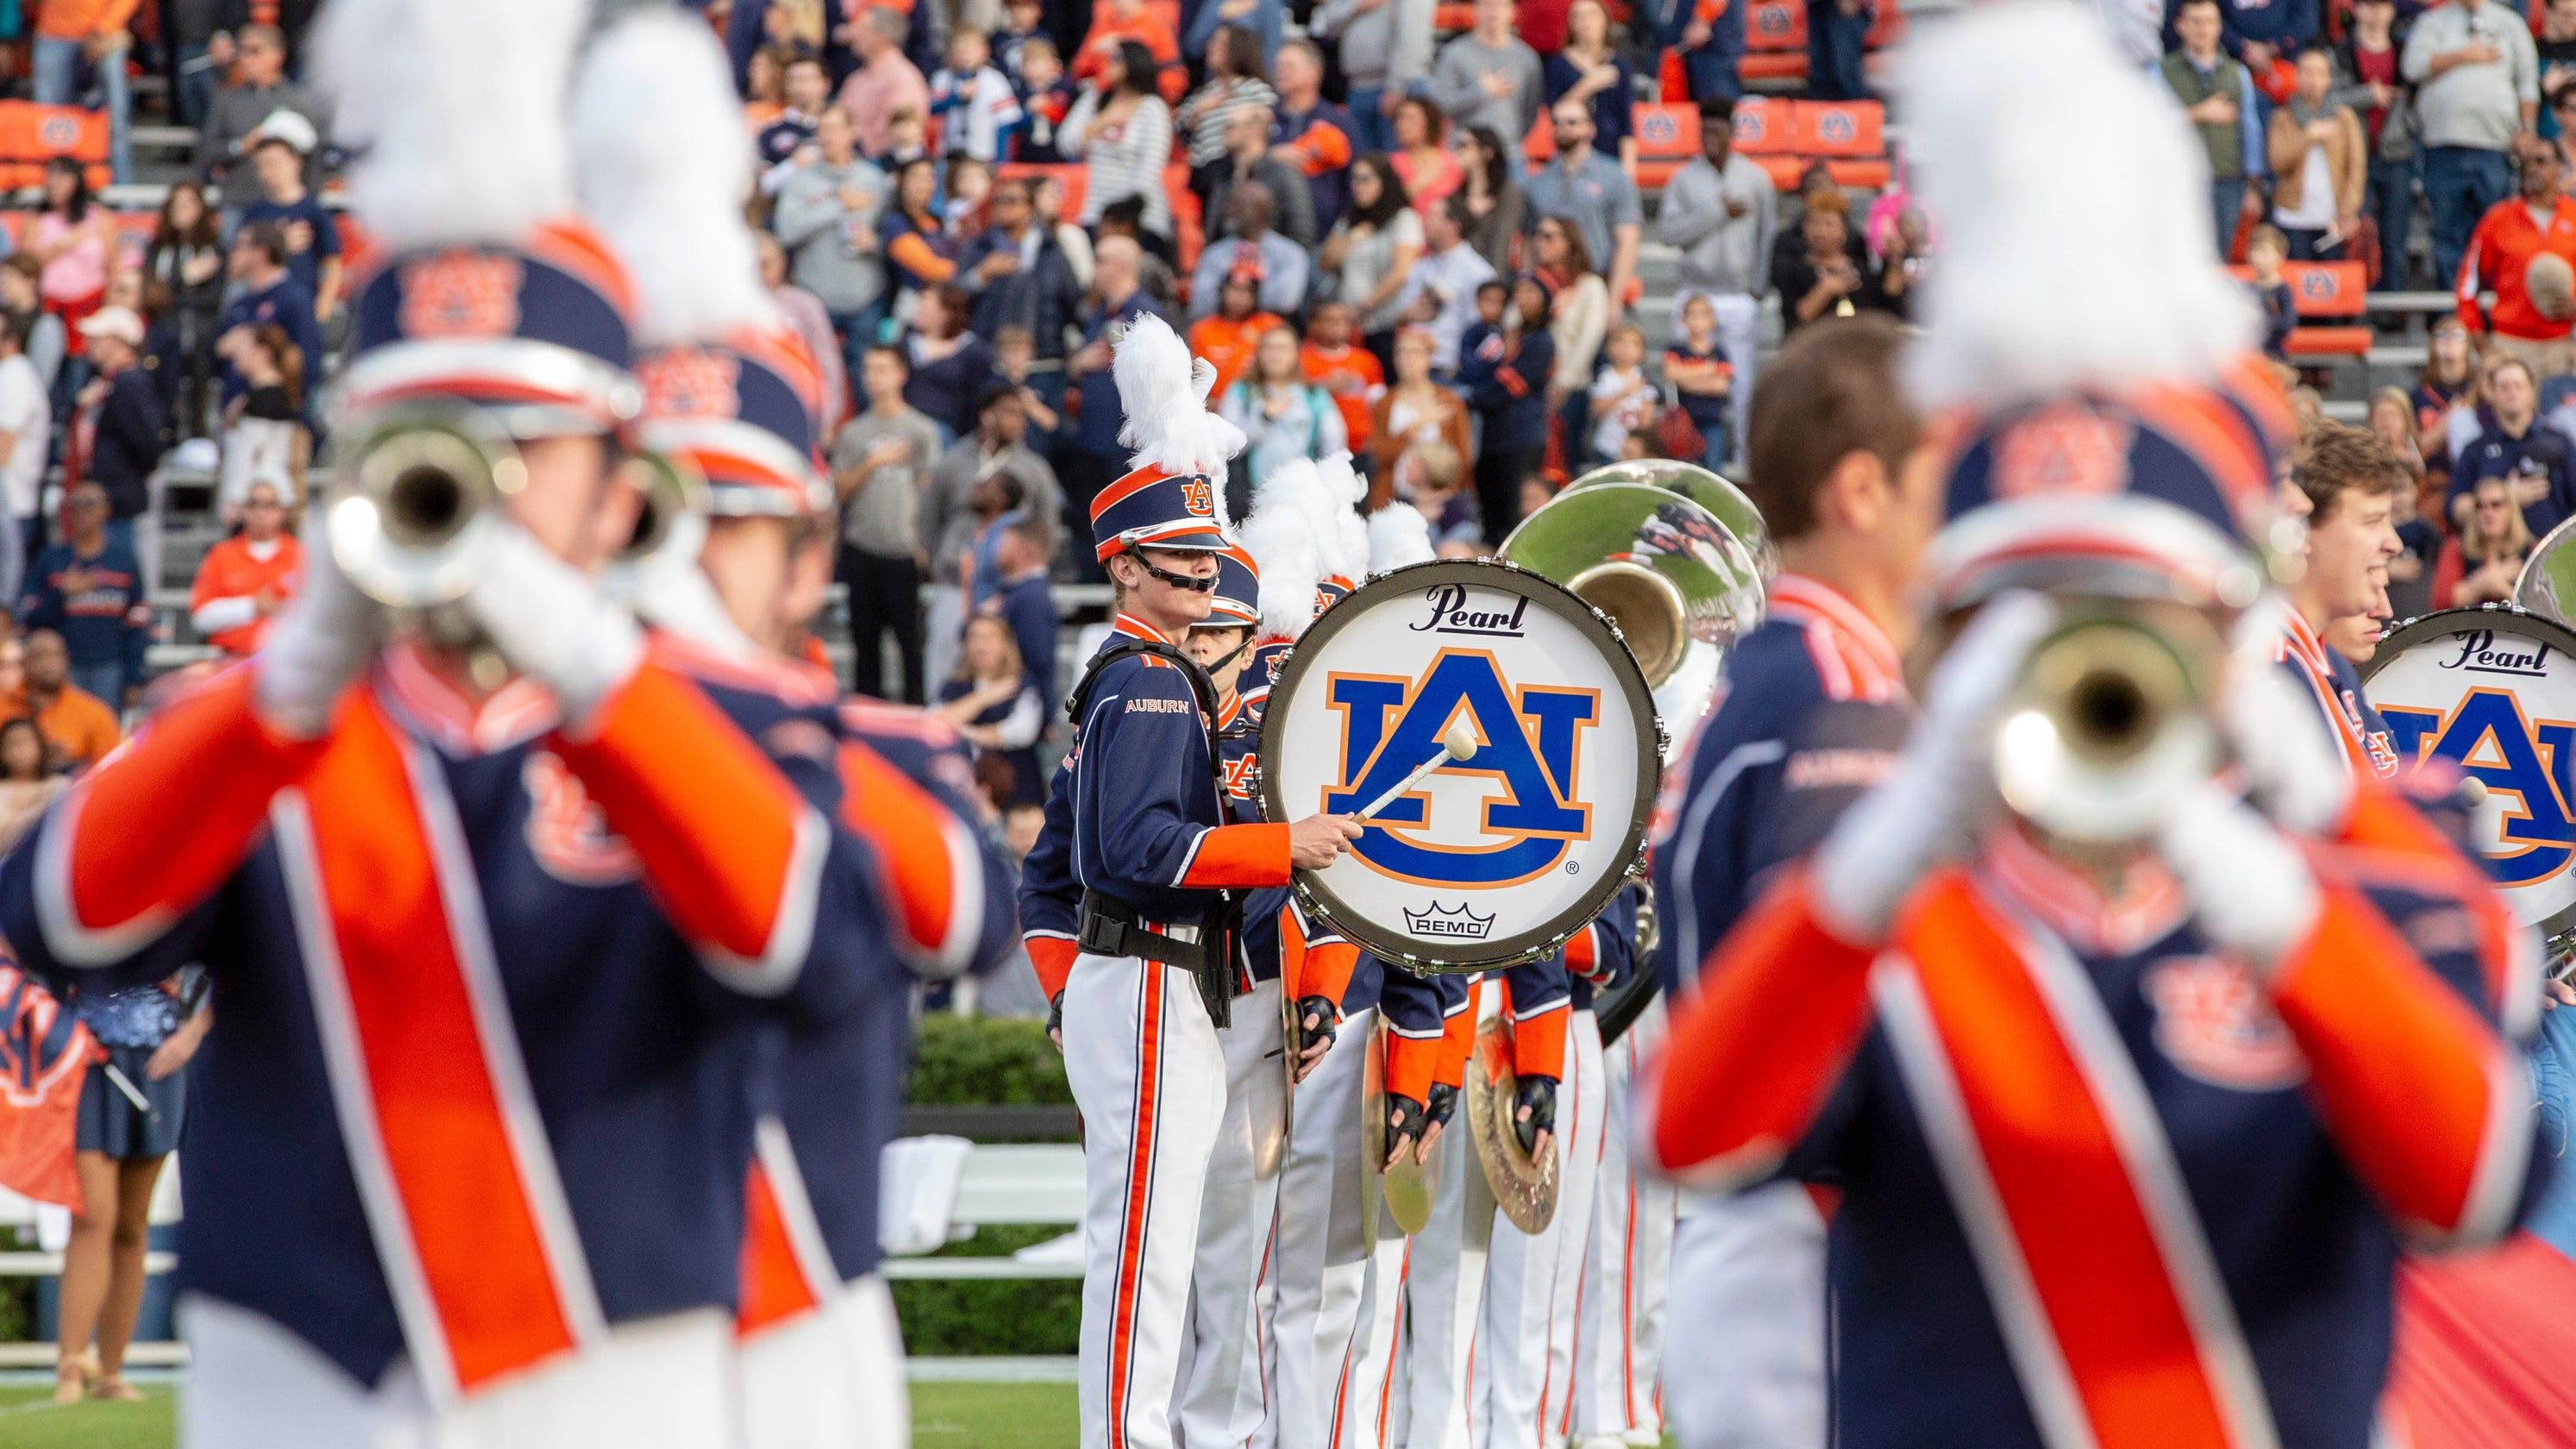 A family affair: Auburn University Marching Band shares